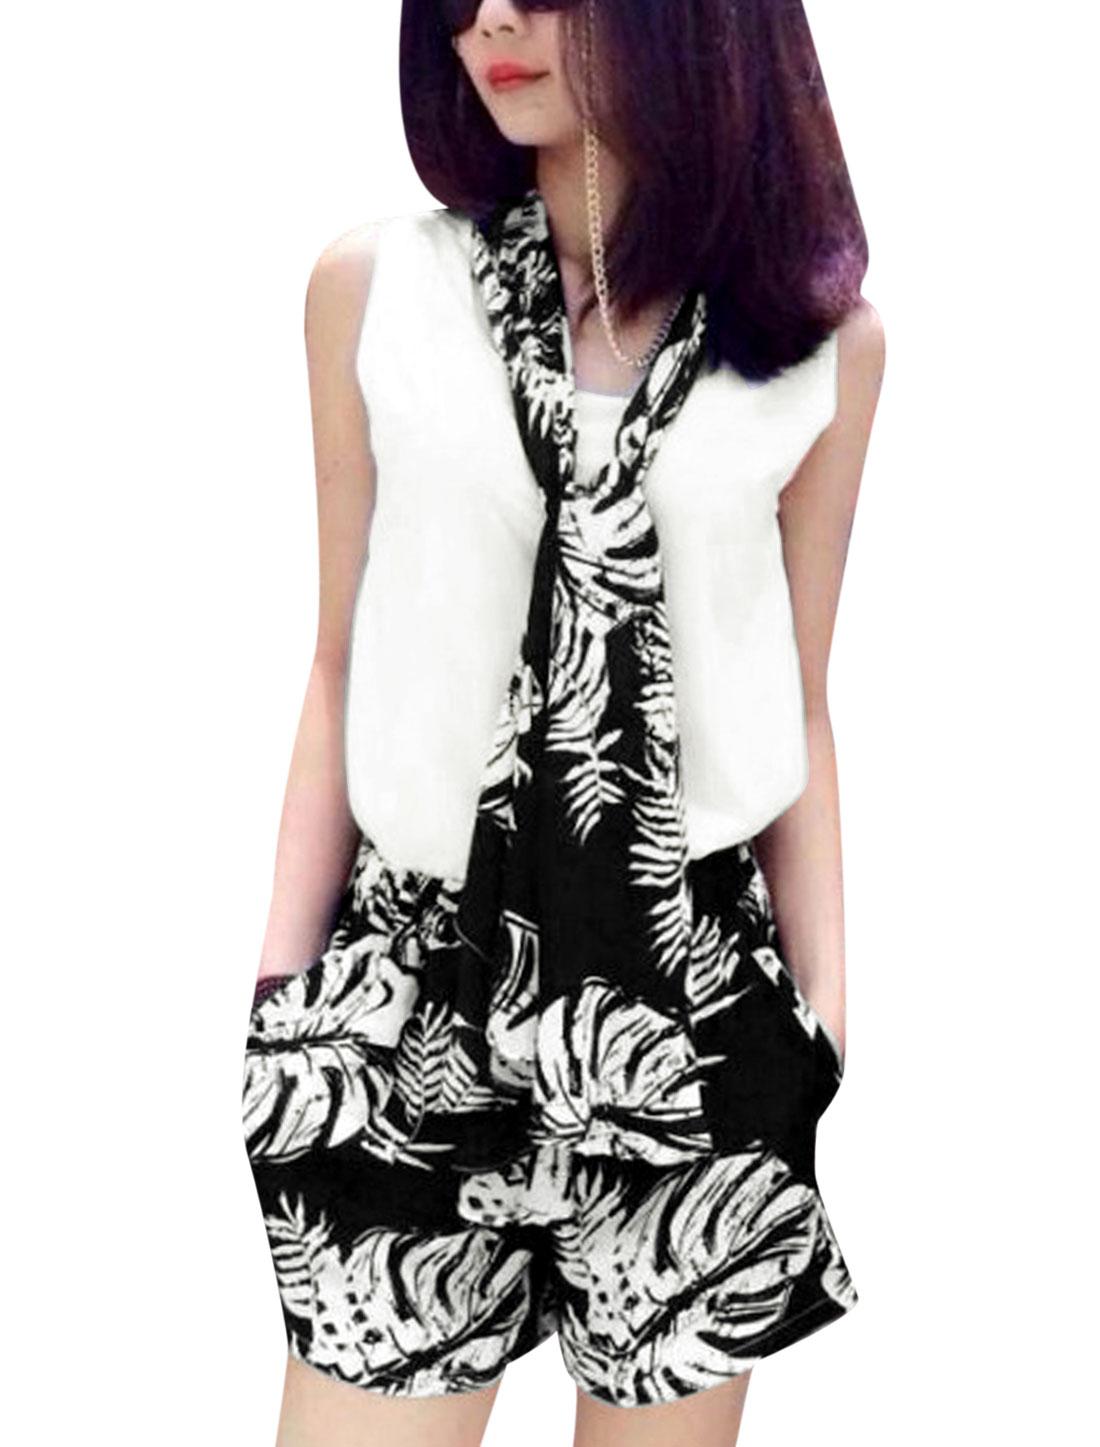 Lady Novelty Prints Black Shorts Set w Sleeveless White Top w Scarf XS